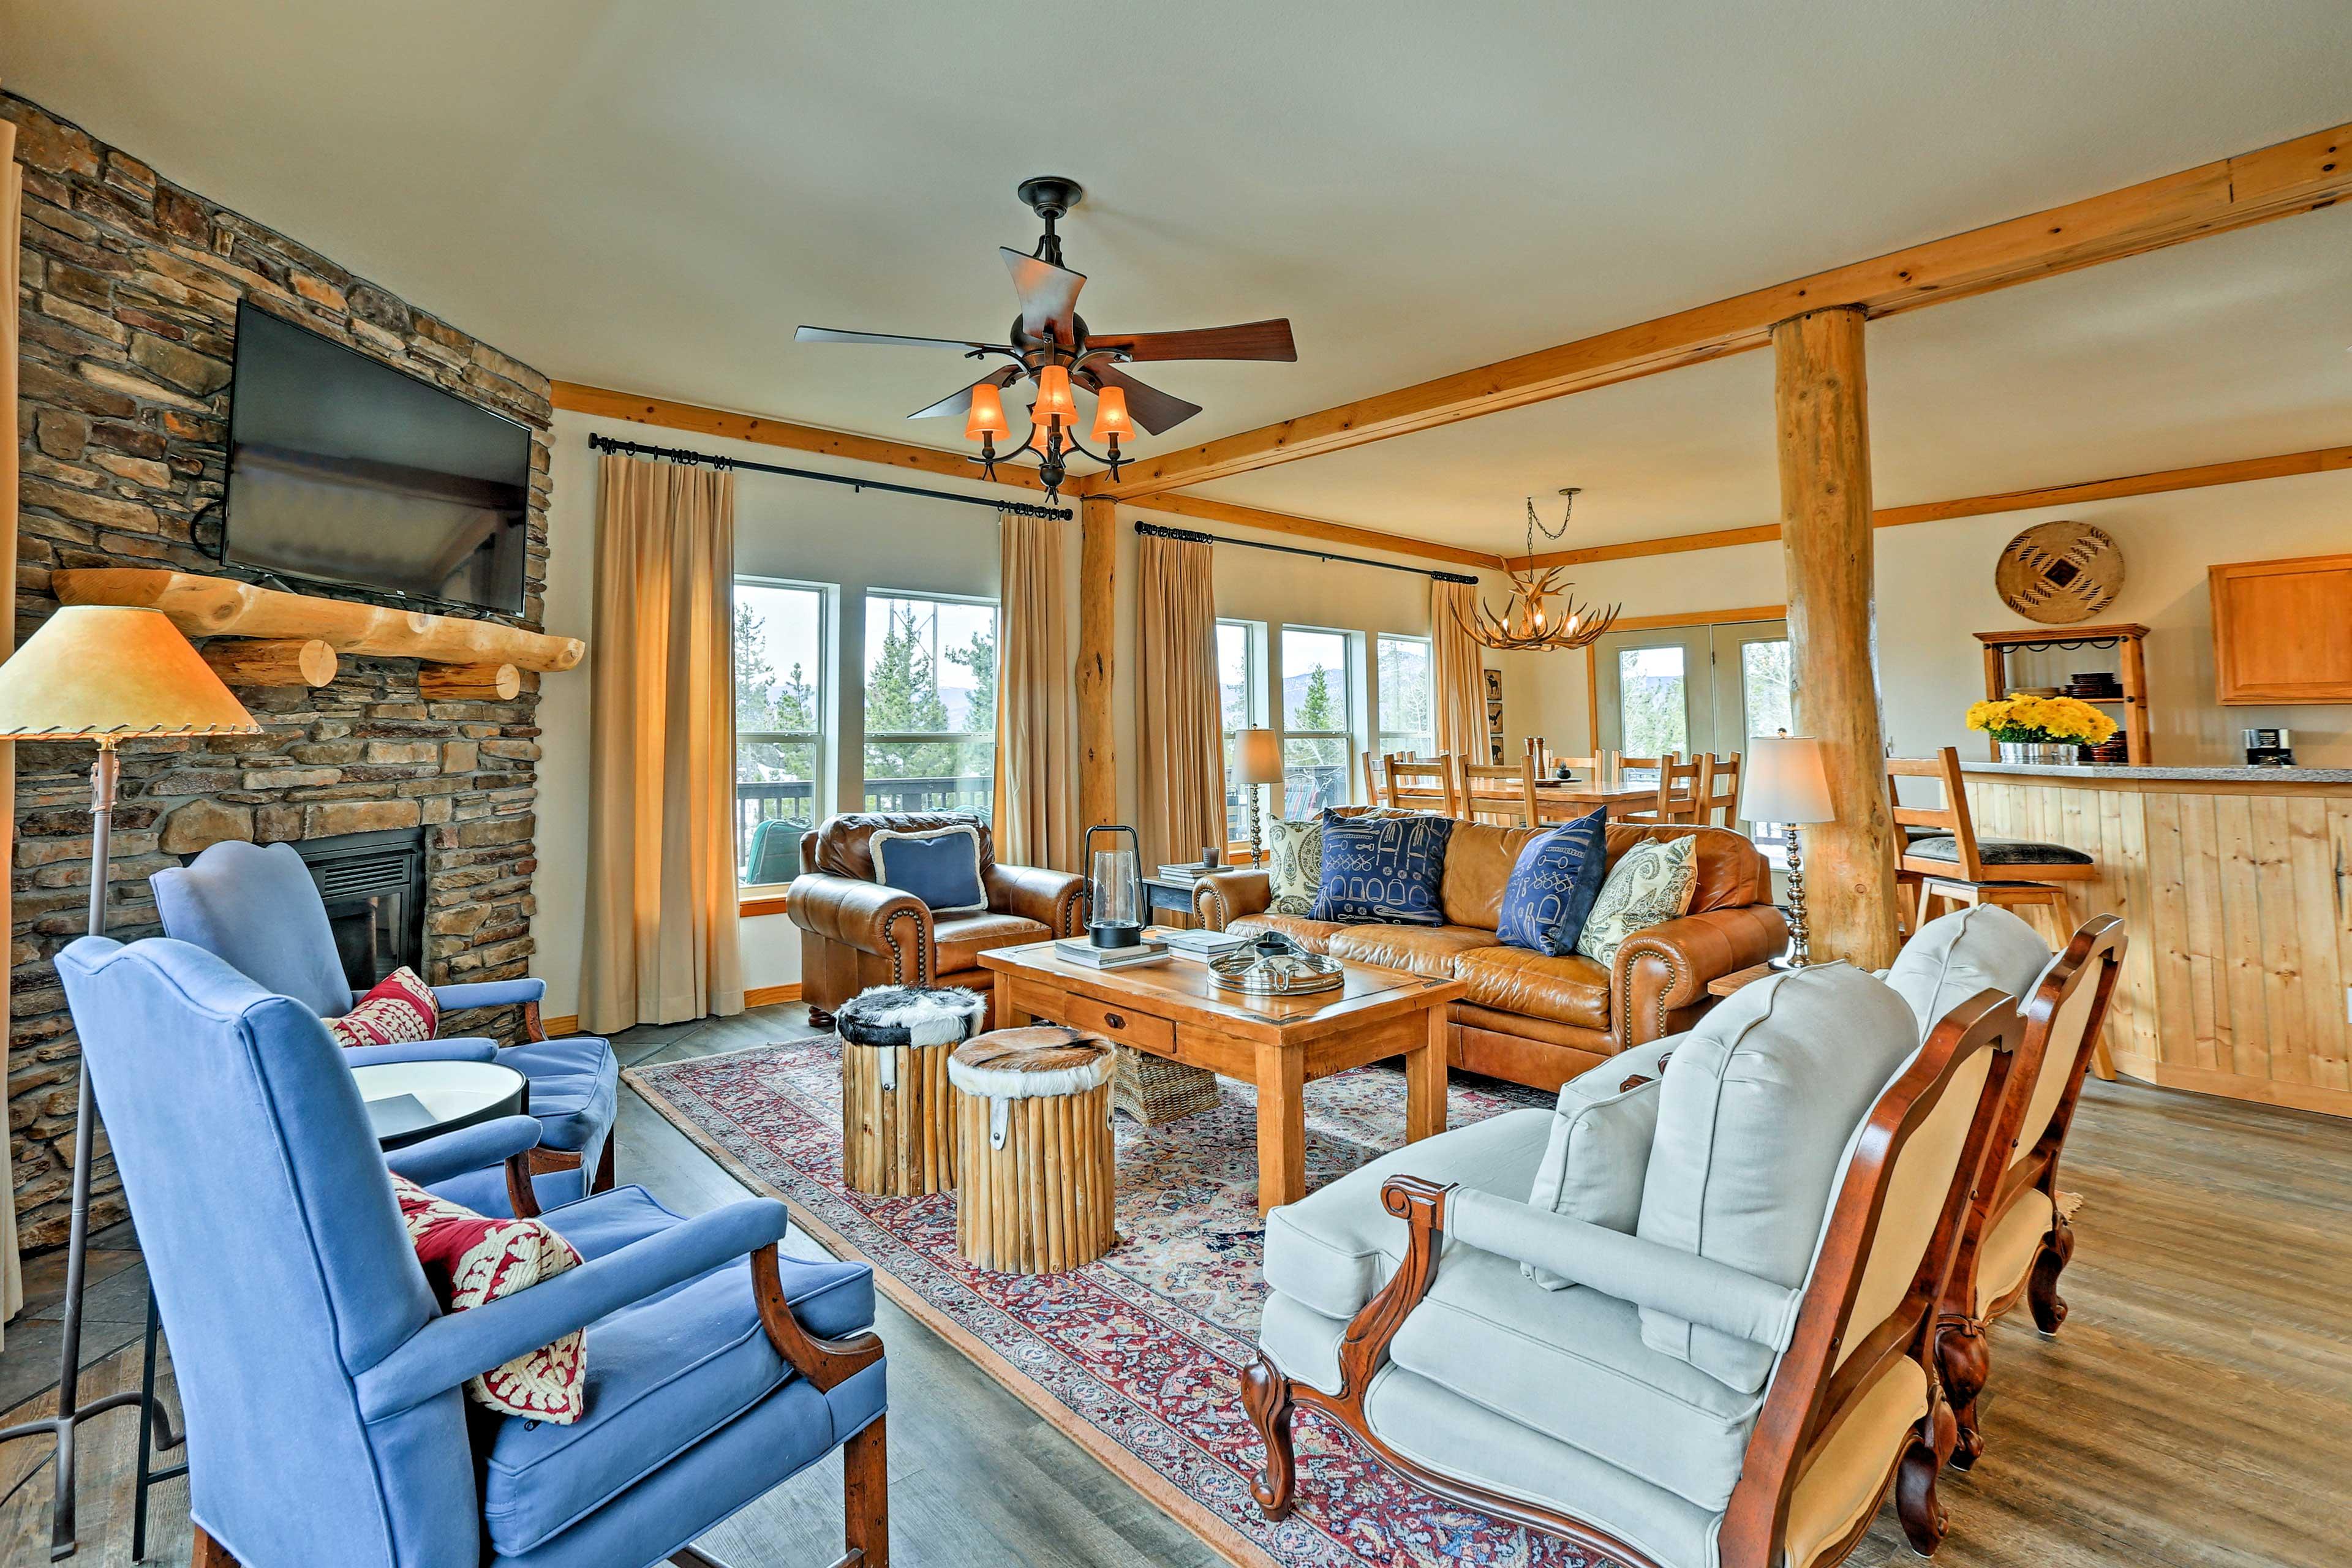 Granby Vacation Rental | 5BR | 3BA | 3,000 Sq Ft | 2 Stories